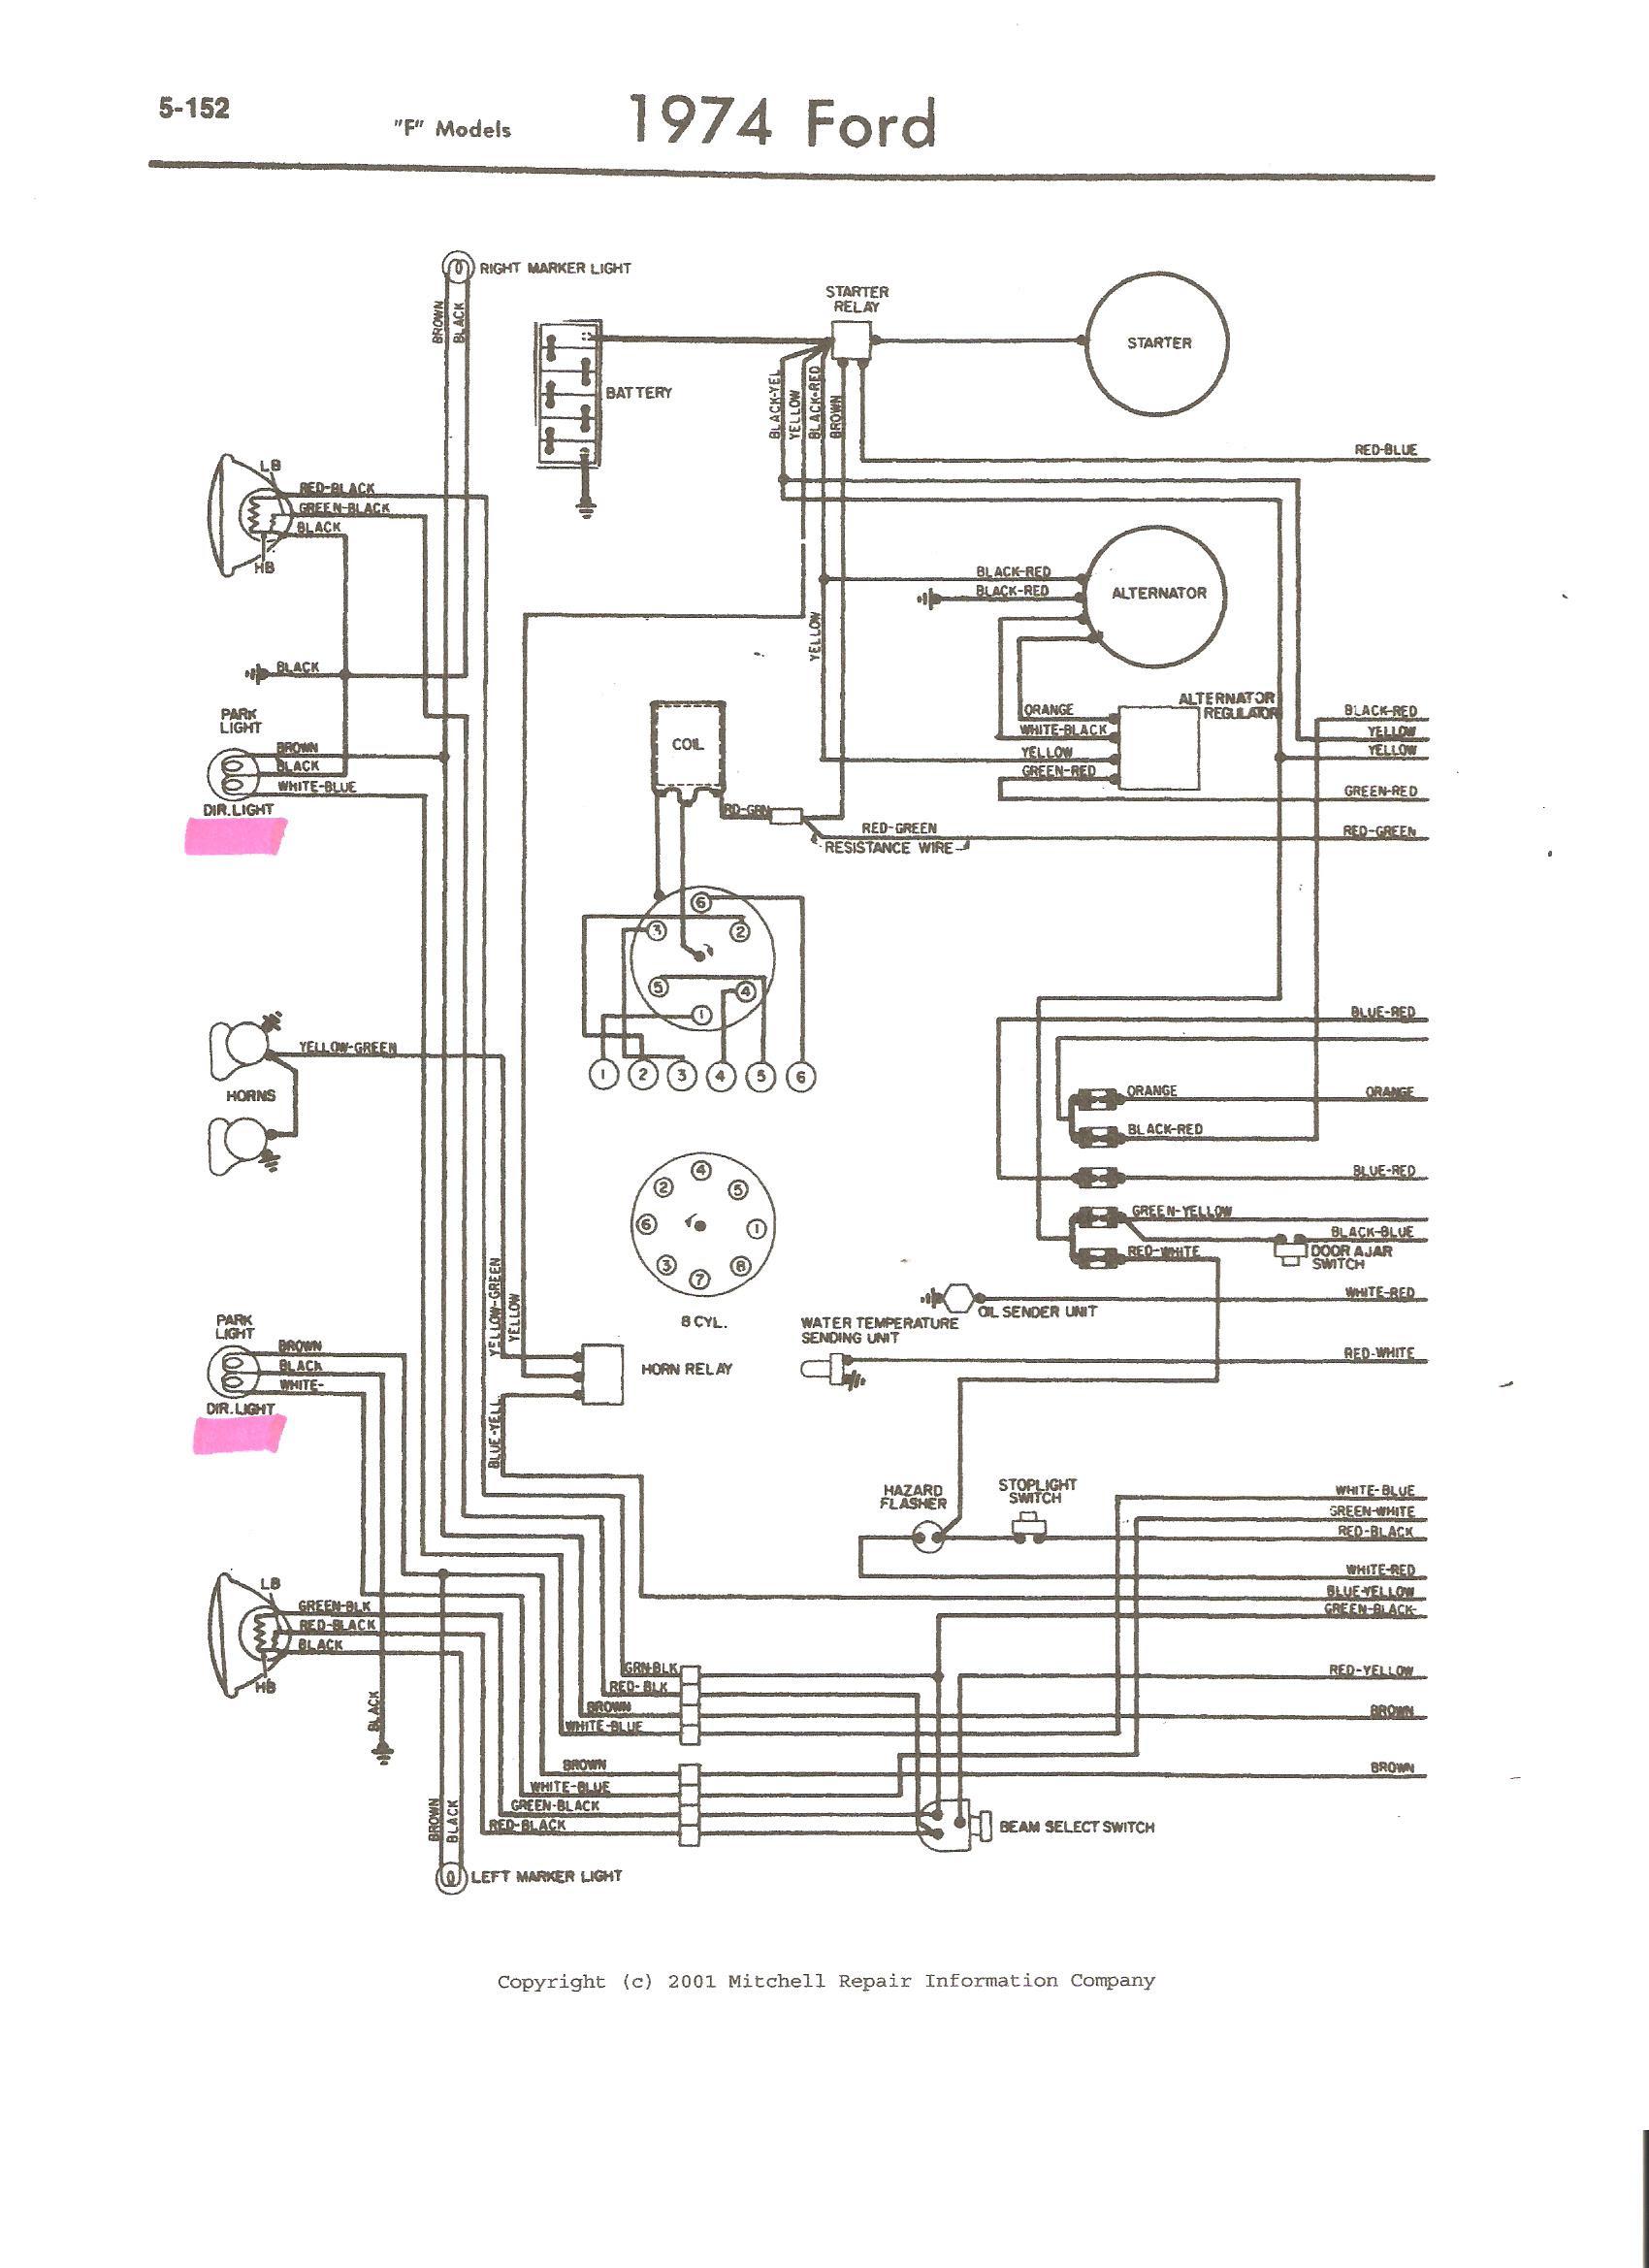 Diagram 1964 F100 Brake Light Diagram Full Version Hd Quality Light Diagram Data Wiringonline Doanbe It